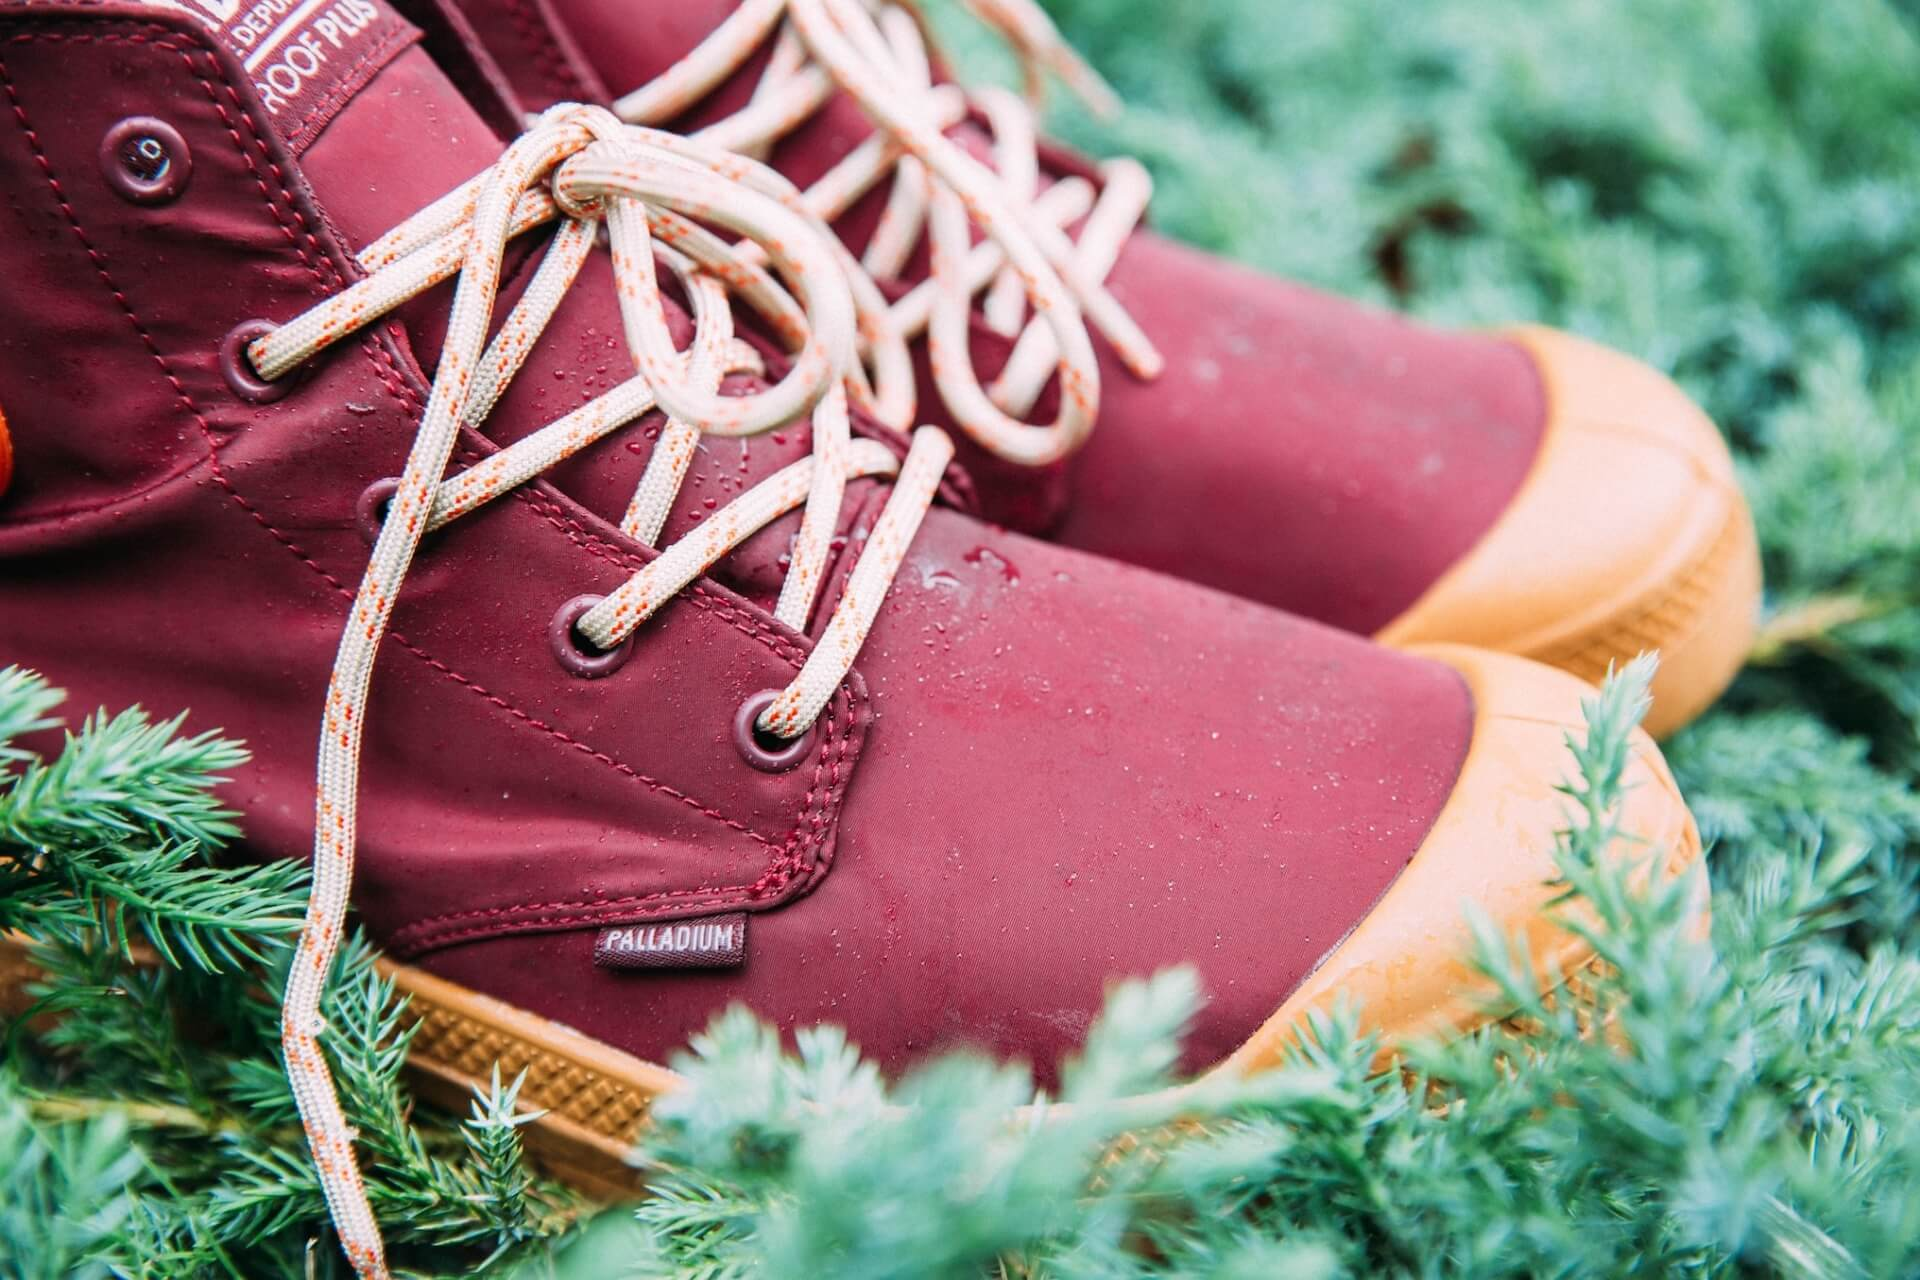 PALLADIUM徹底解剖|雨の日やアウトドア/フェスで大活躍するおしゃれな防水靴の秘密 life-fashion190704-palladium-8